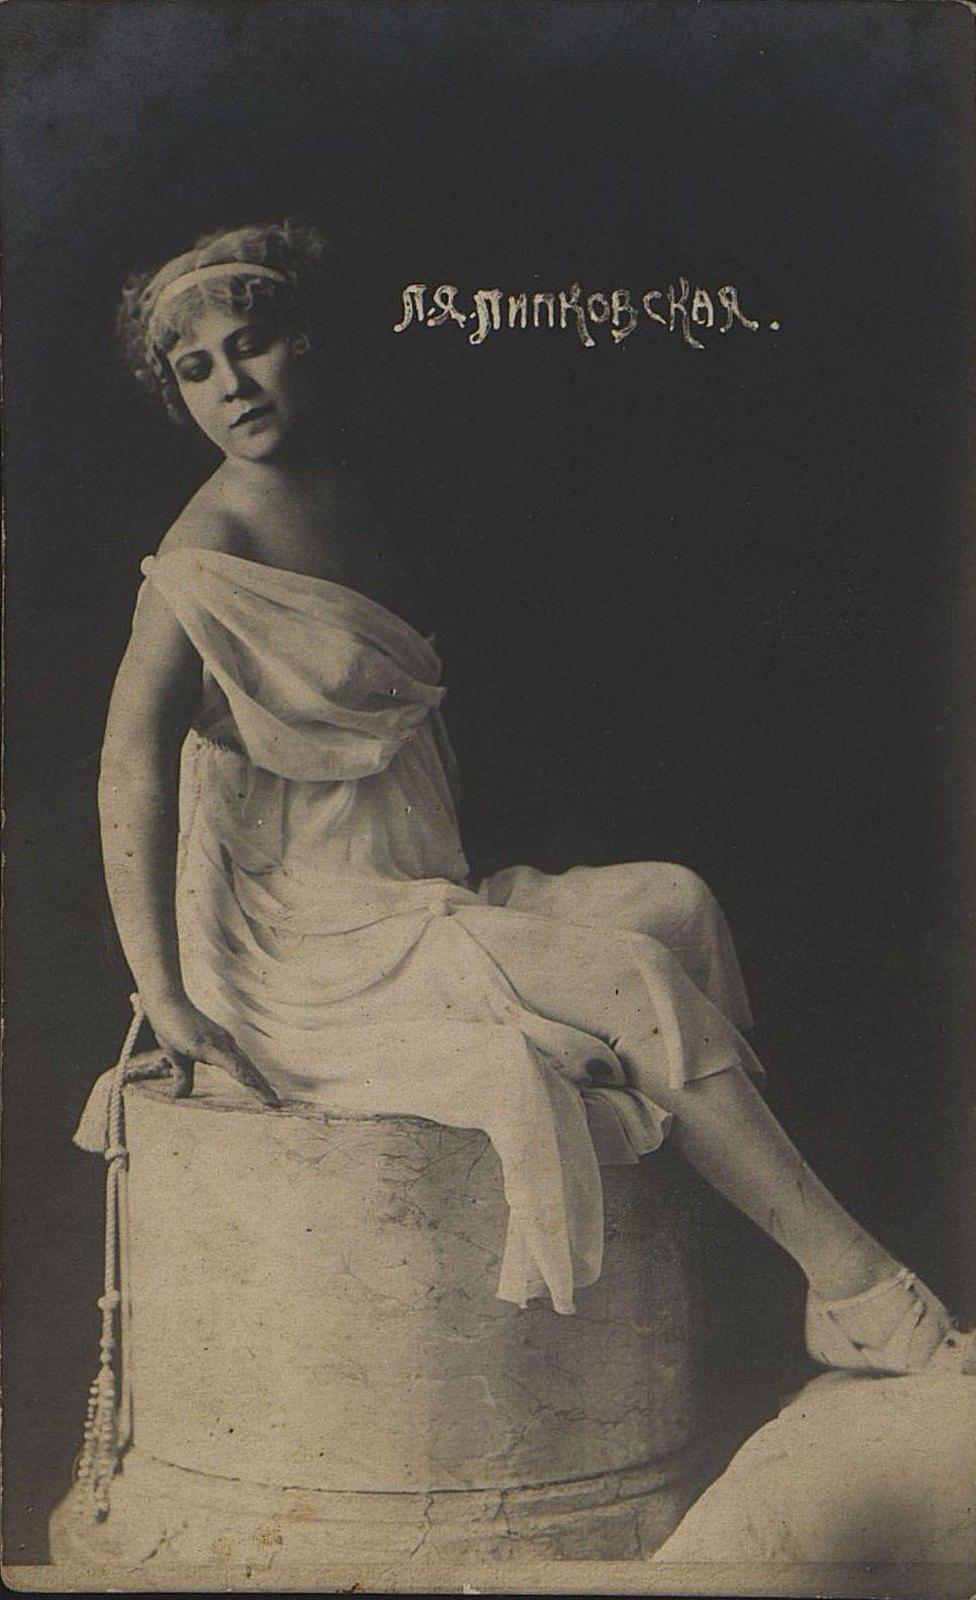 Липковская Л.Я., артистка Одесского оперного театра. 1916-1918 гг.